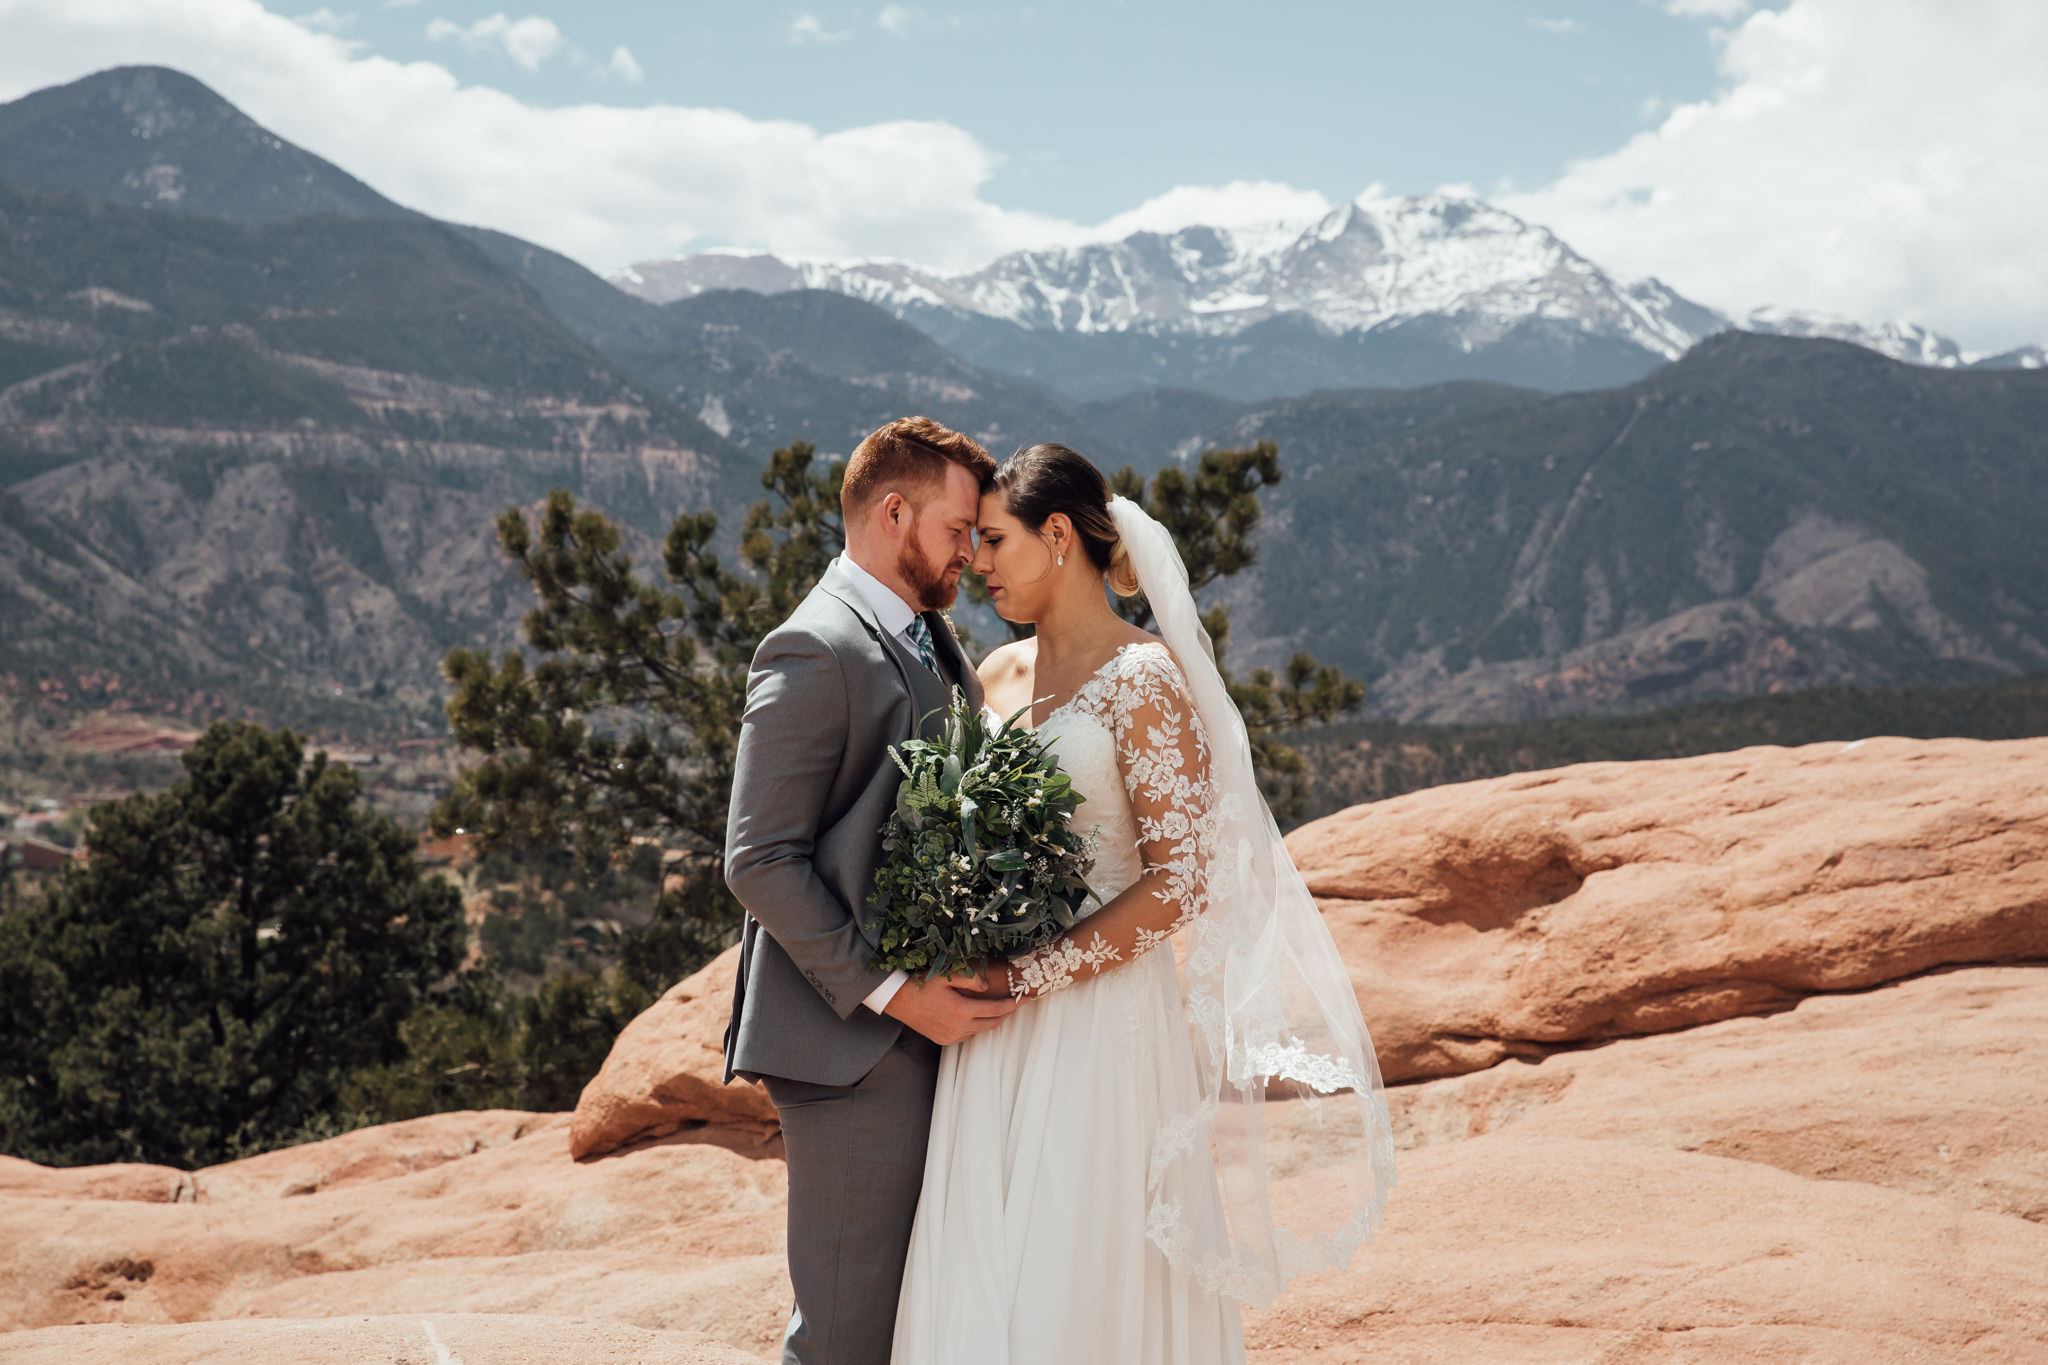 phantom-canyon-brewery-colorado-springs-wedding-photographer-85.jpg